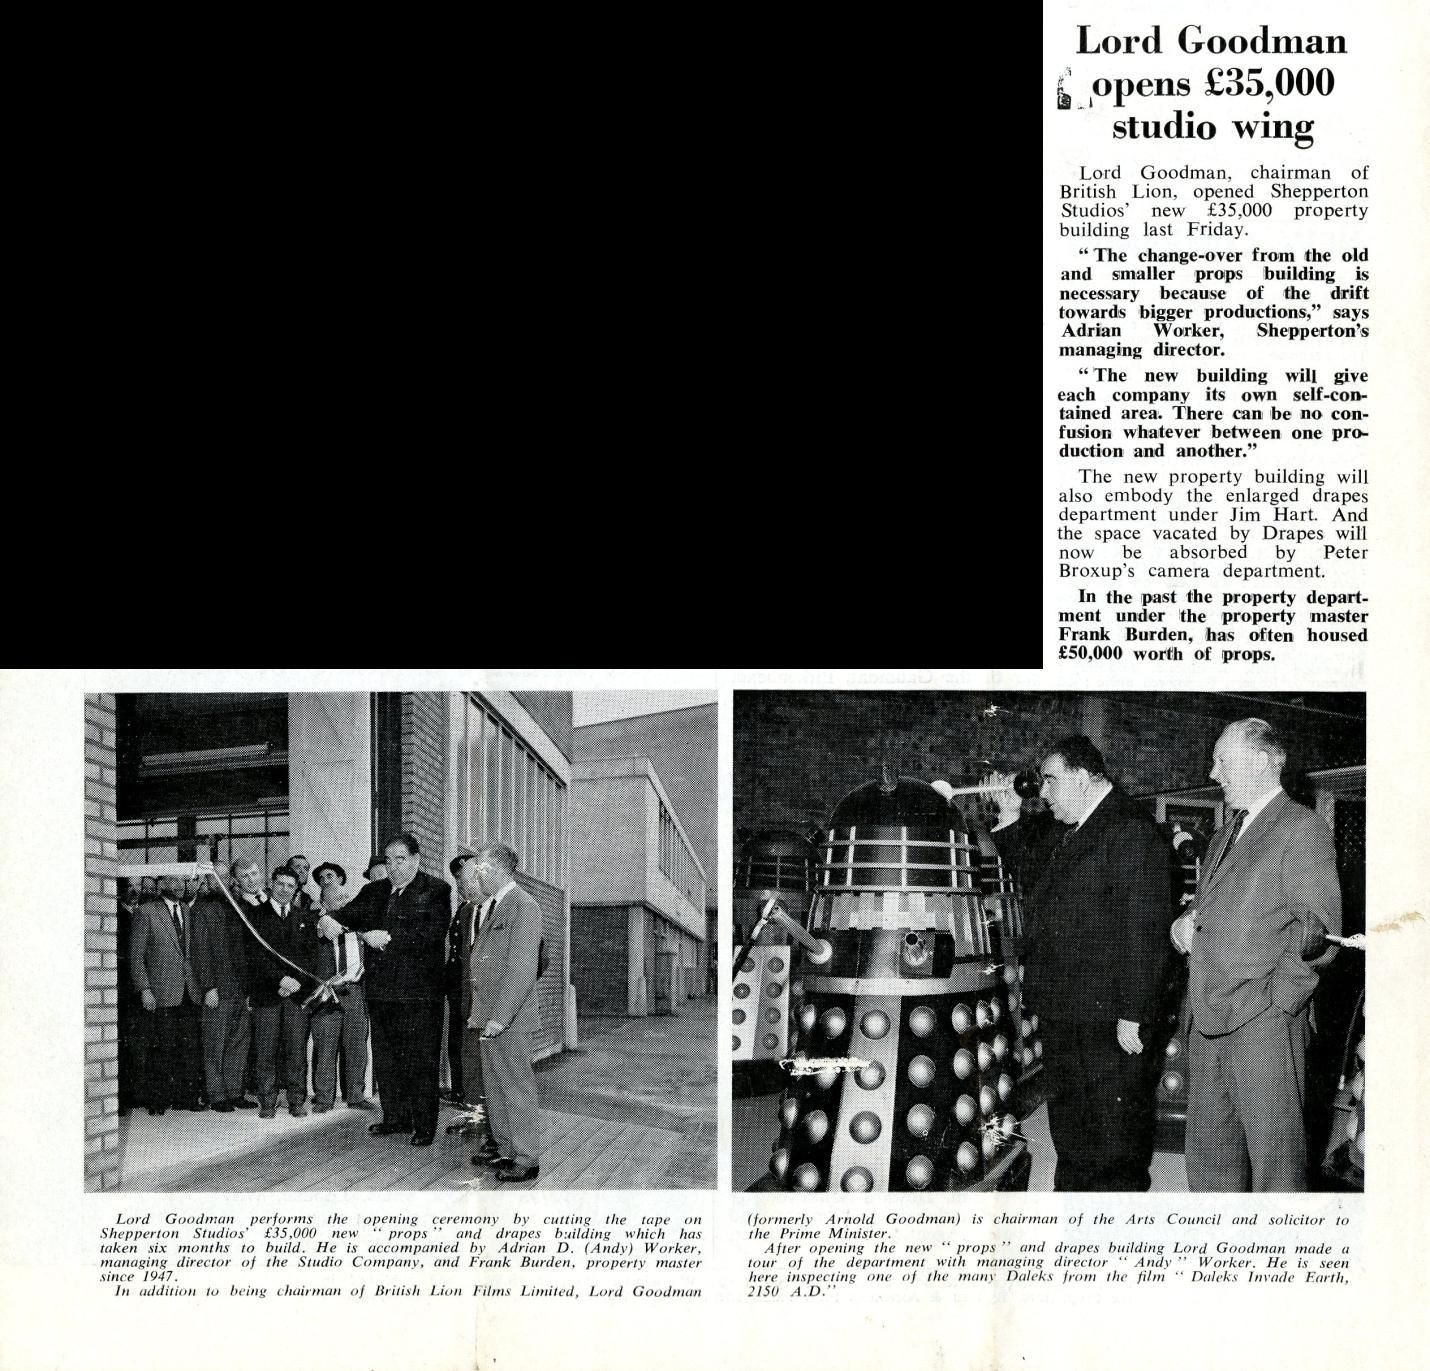 Daily Cinema, 20 April 1966